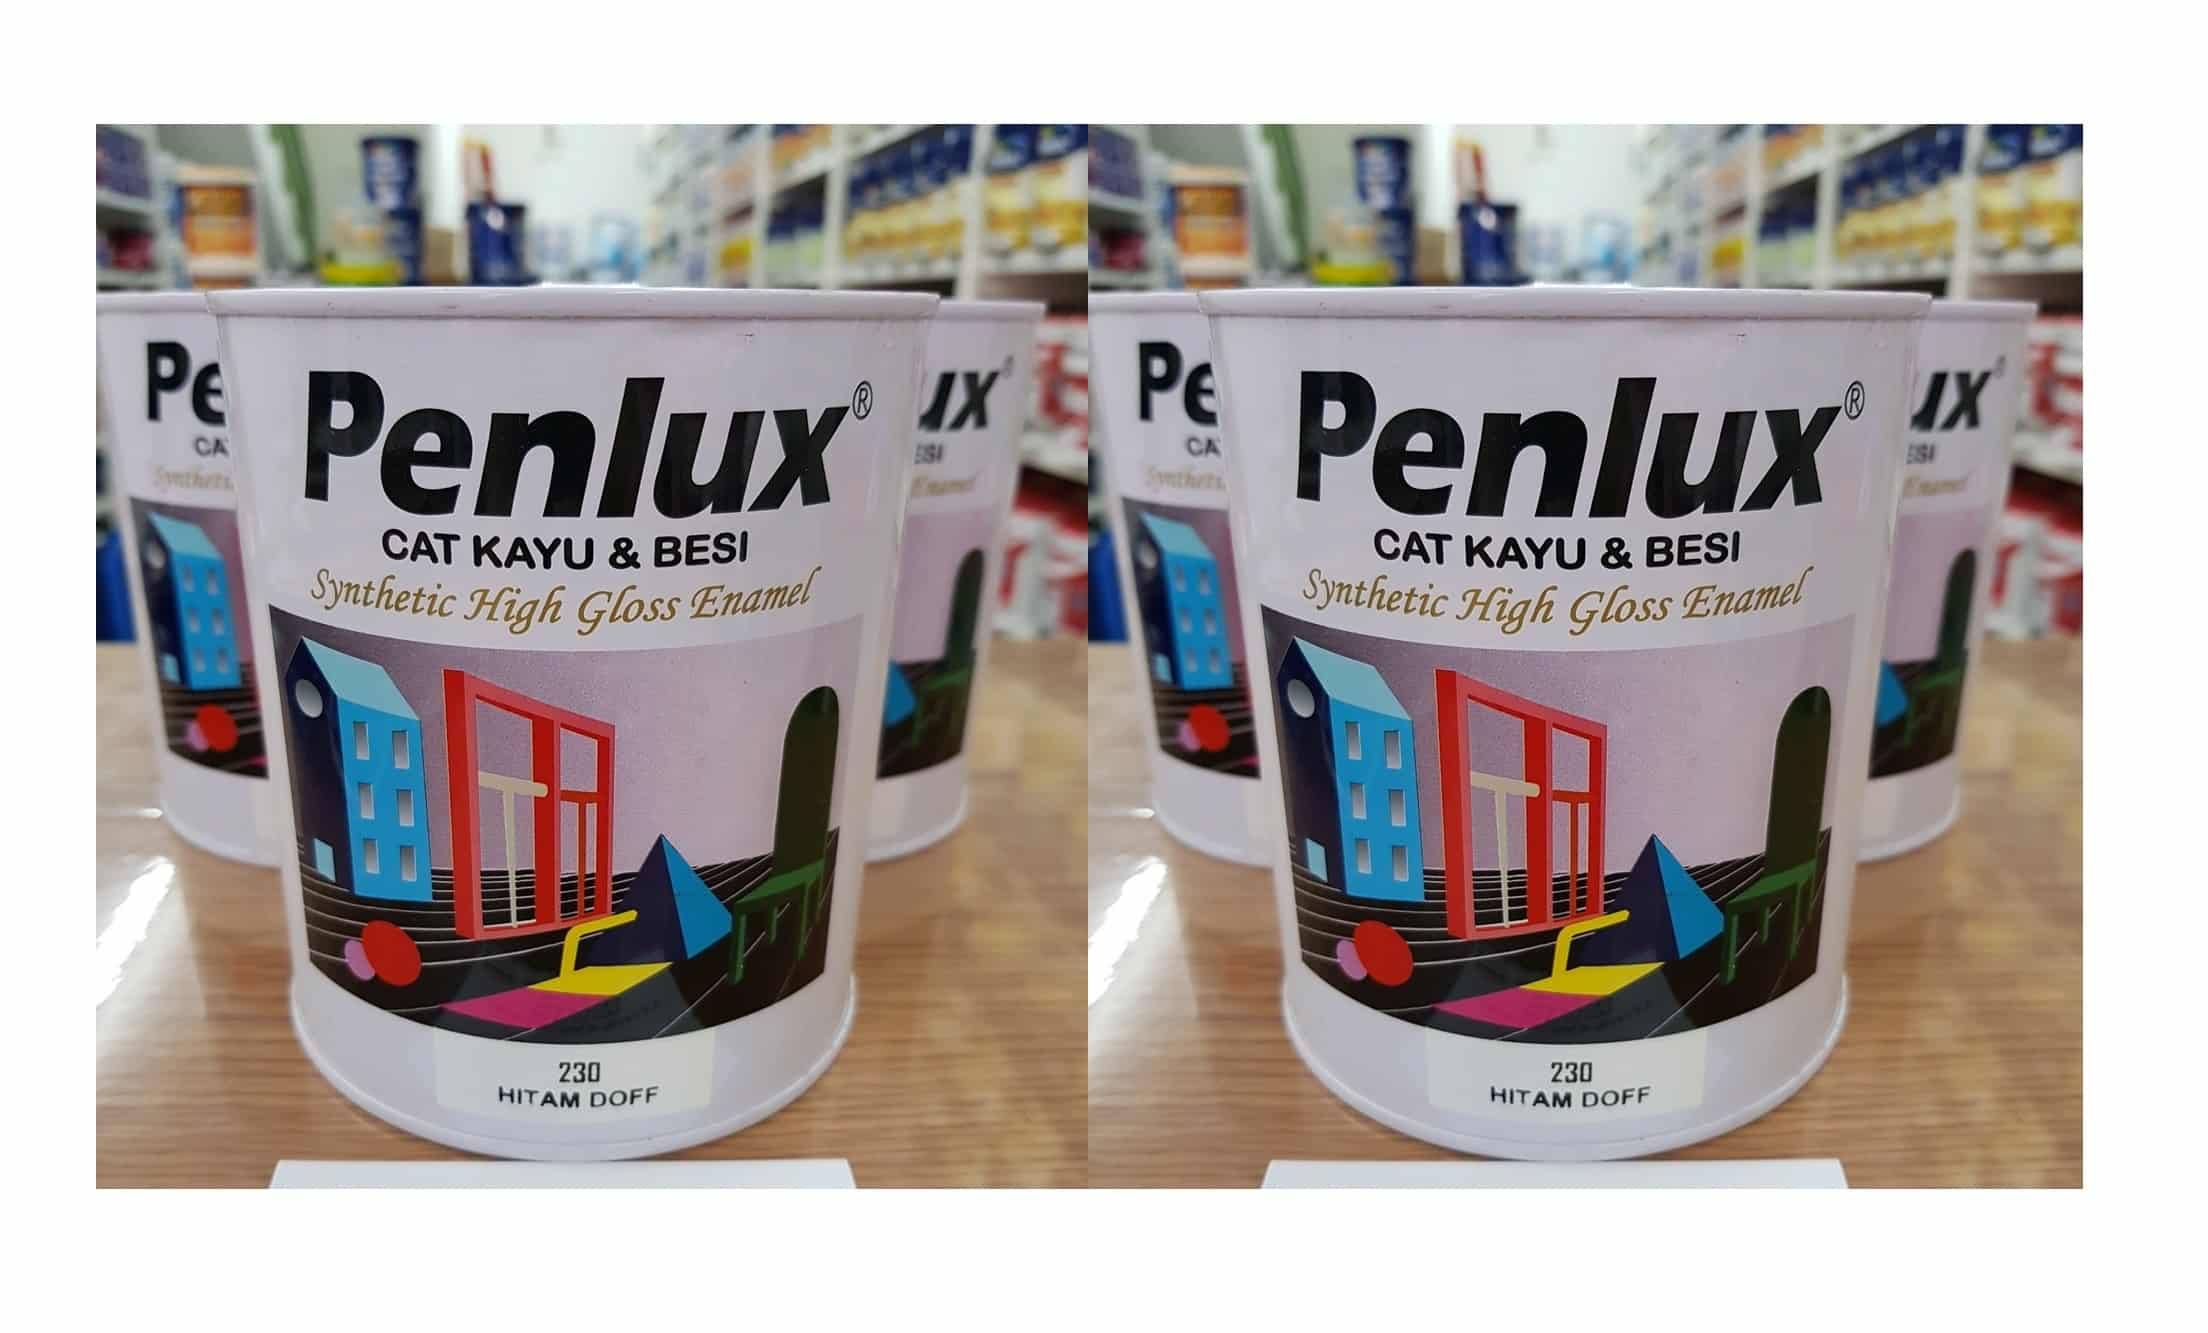 Penlux-Synthetic-High-Gloss-Enamel